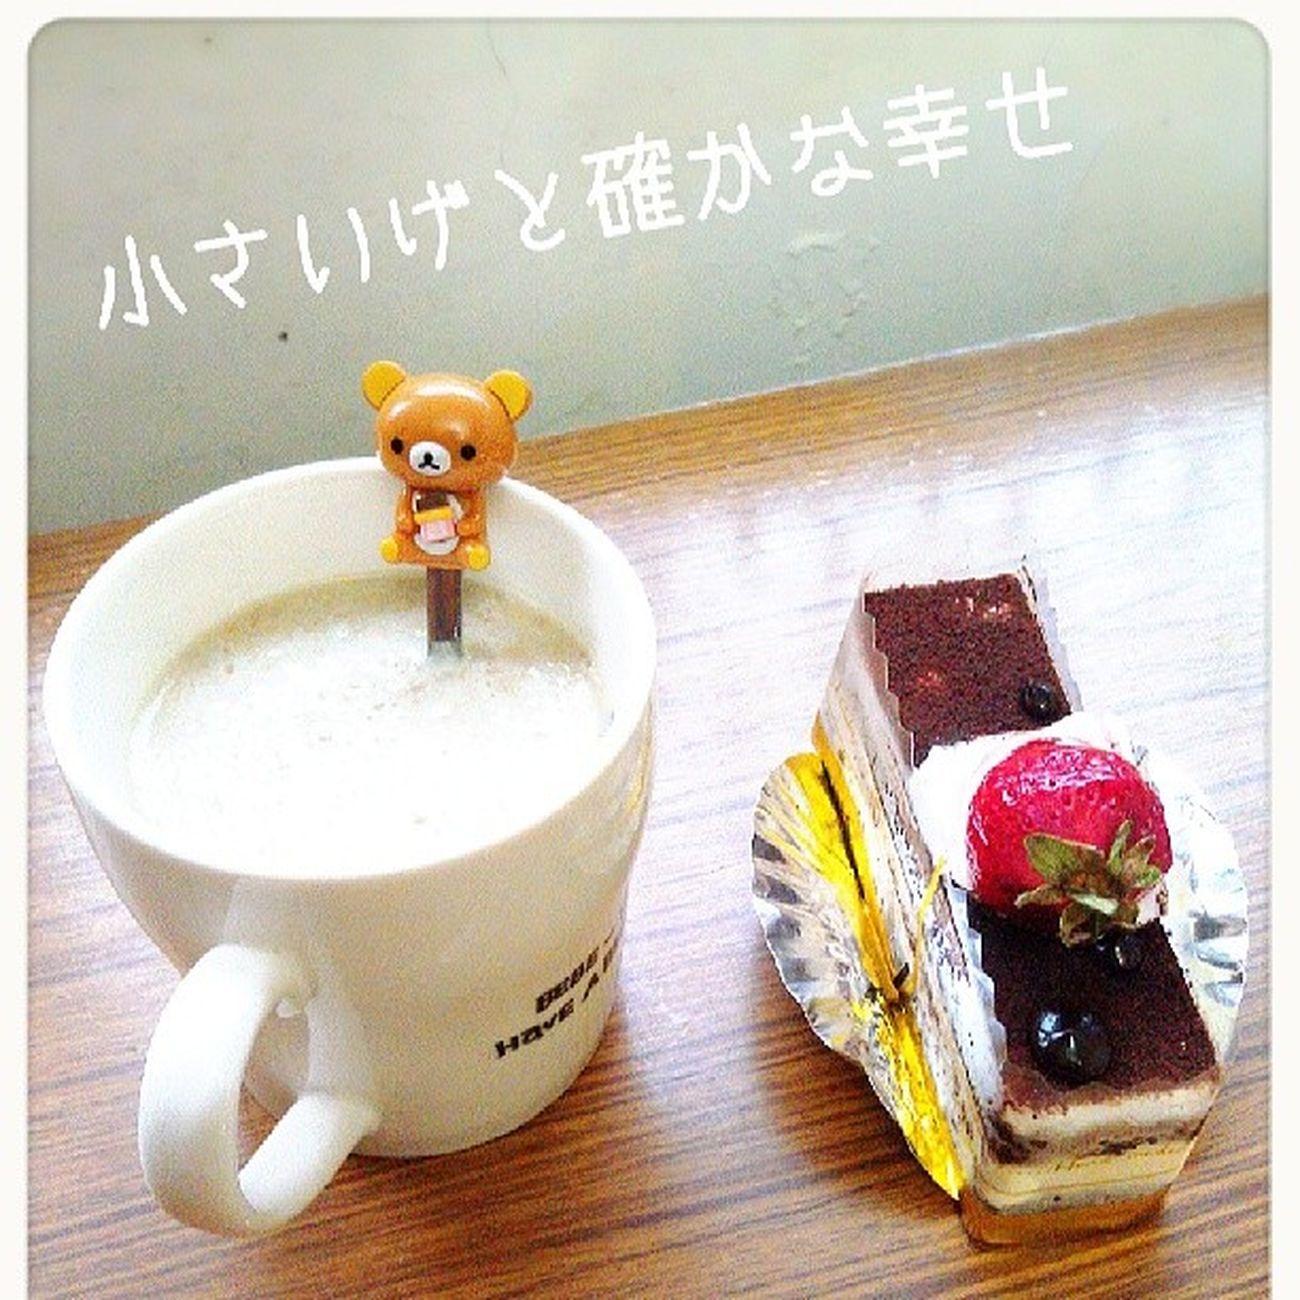 Tea time (*∀*) めちゃくちゃ いい 午後 抹茶 ケーキ